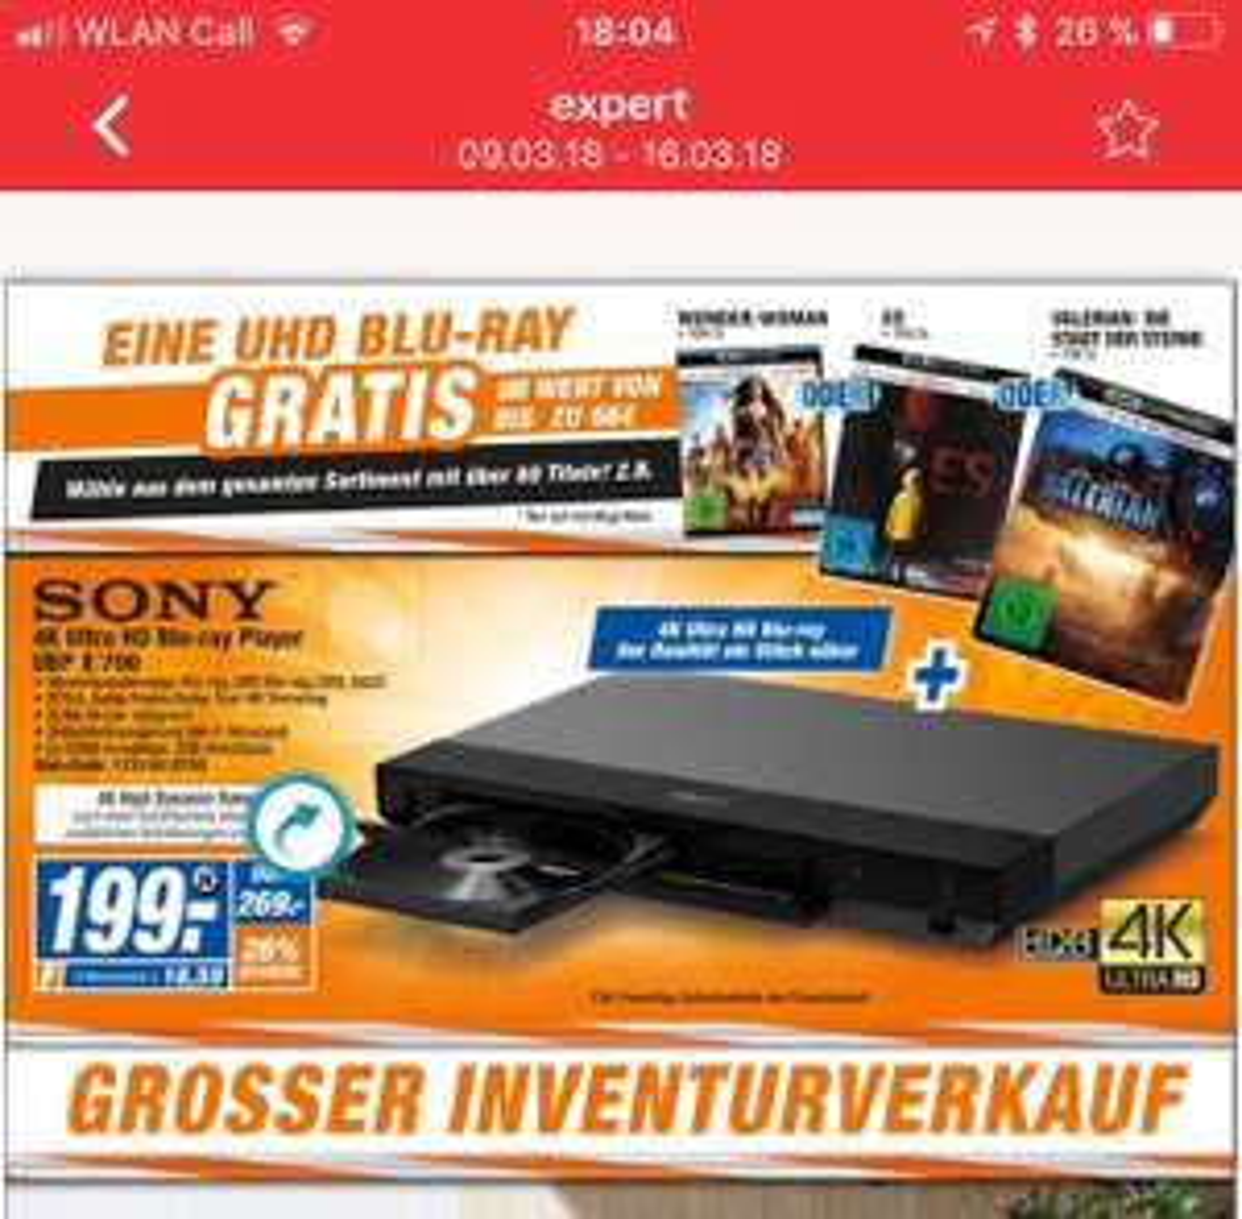 Lokal Melle/Bünde: Sony UBP X700 4K UHD Blu-Ray Player